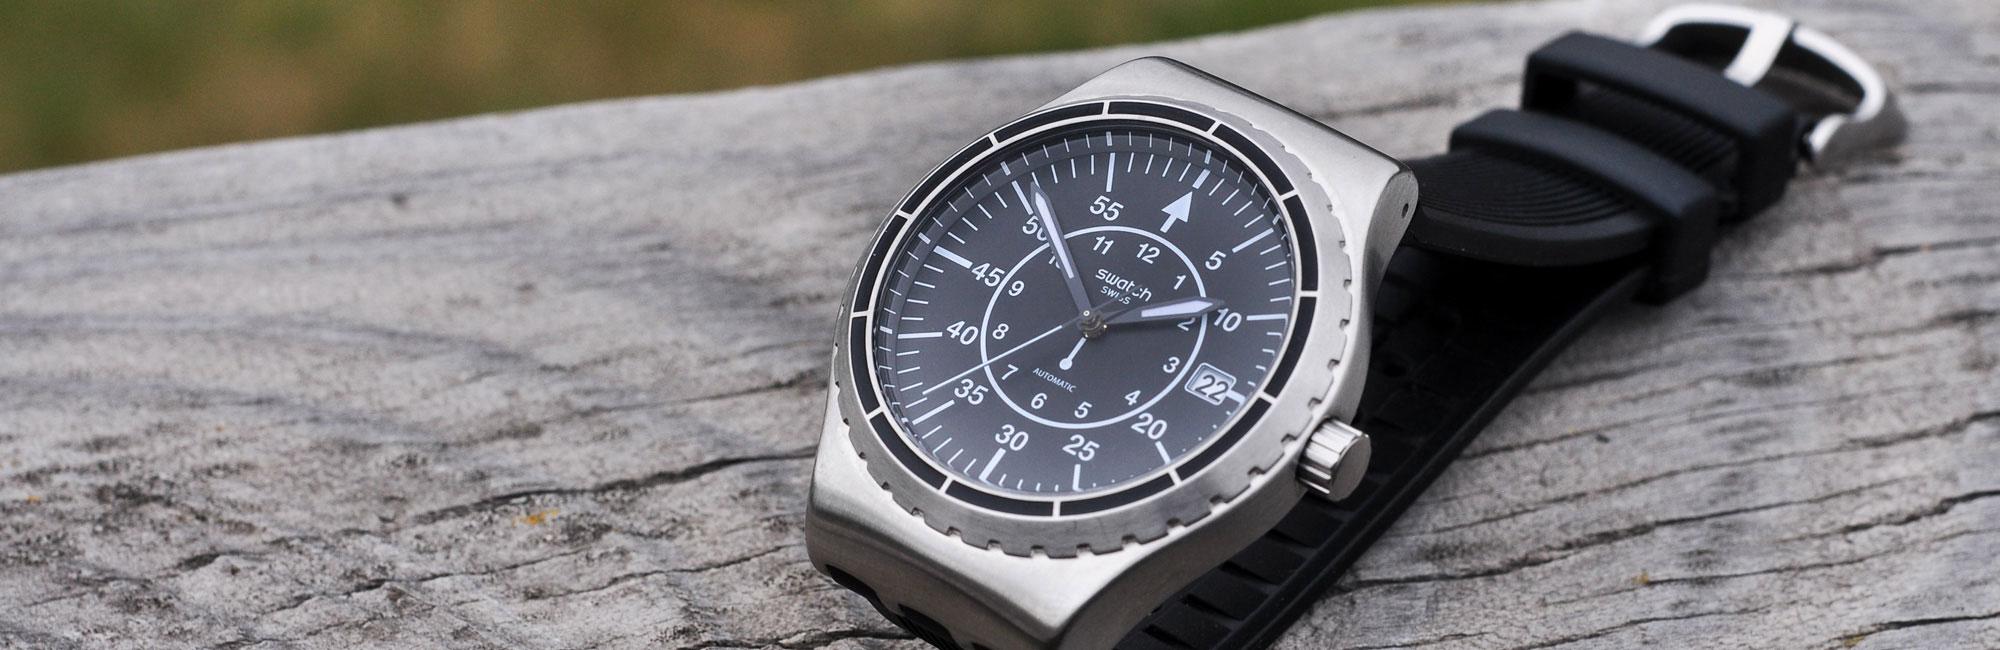 4-orologi-swatch-cauzzi-solferino-mantova